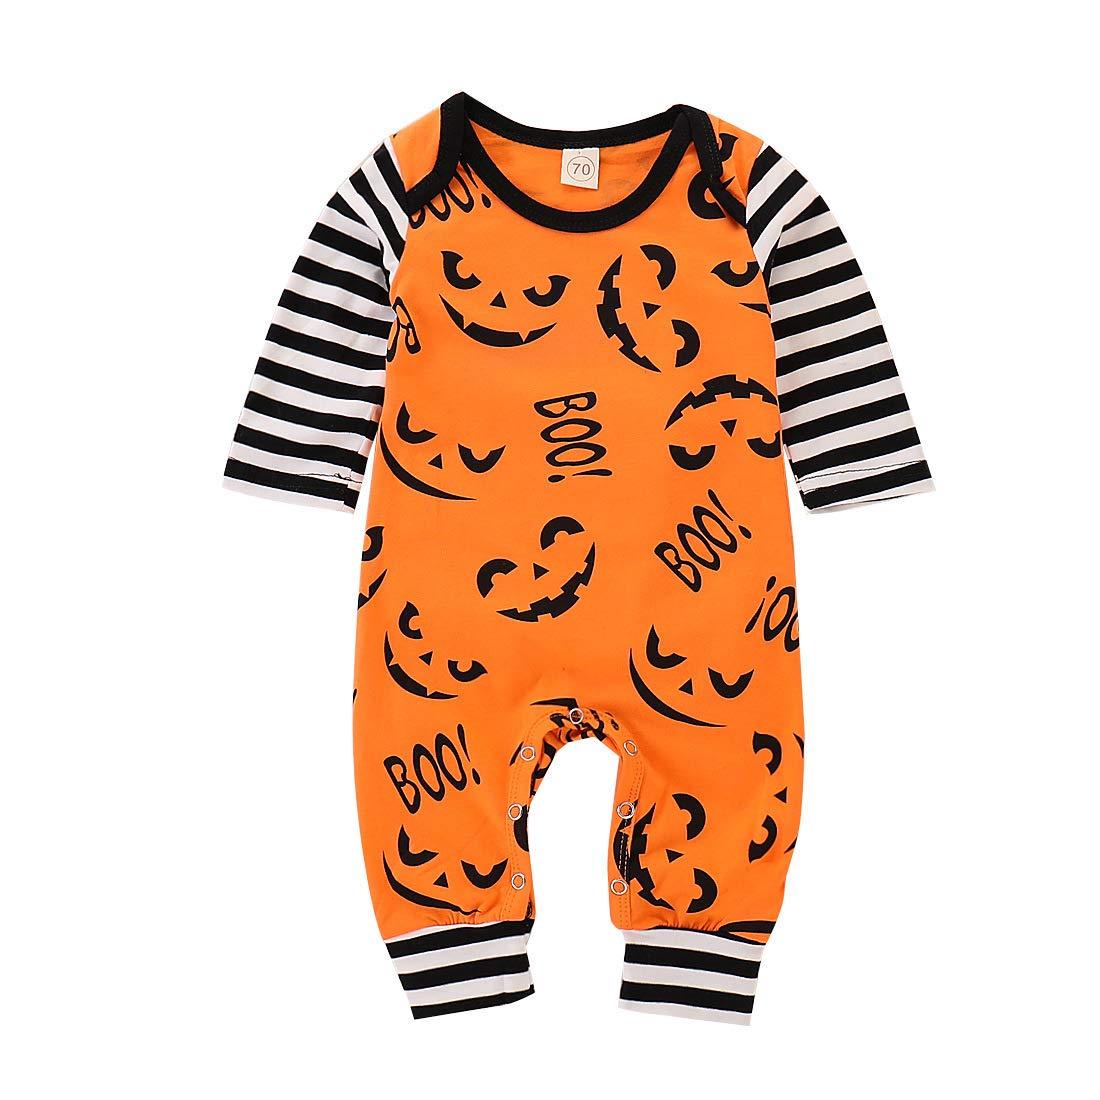 Baby Halloween Outfit Mommy's Little Pumpkin Romper Pumkin Pant Cap Headband Set